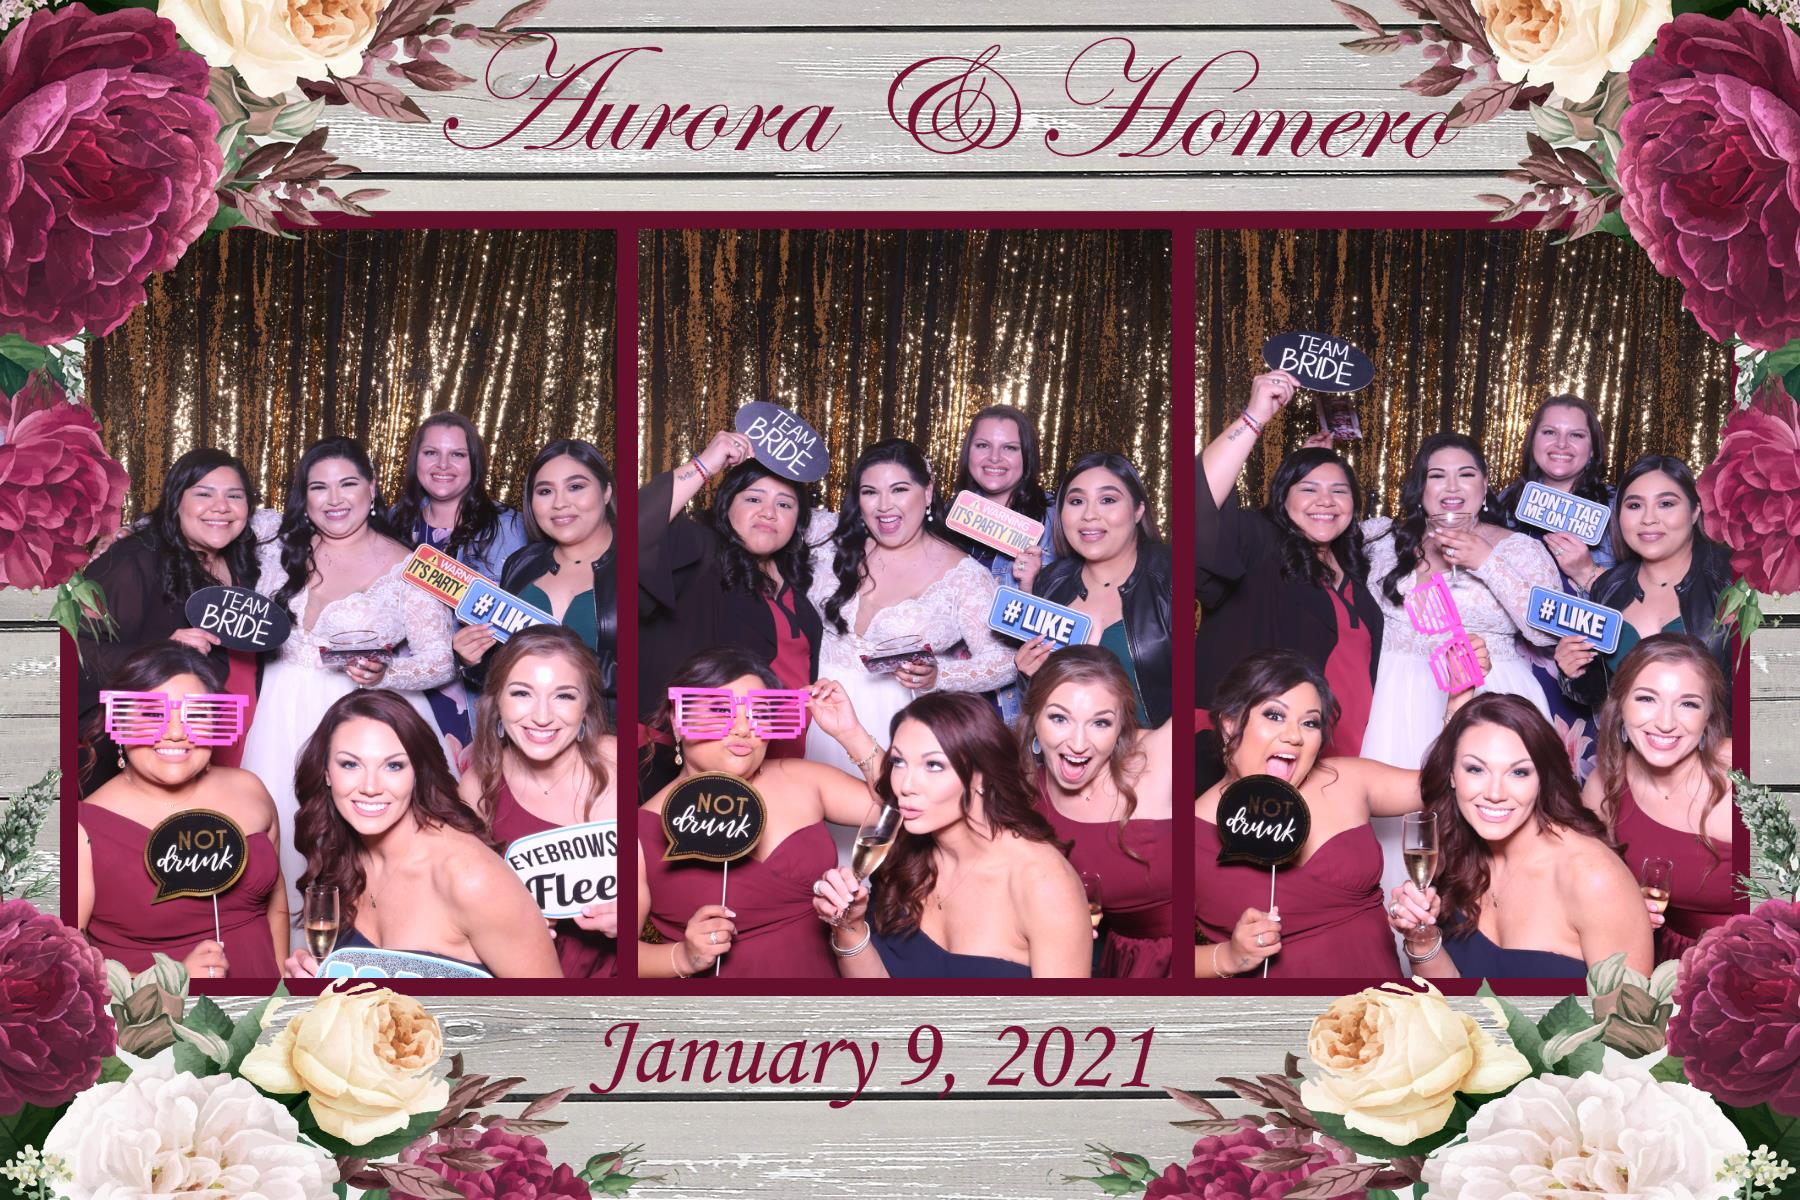 Magic Mirror Booth 3 The Best DJ in Houston for FUN Dancing!!